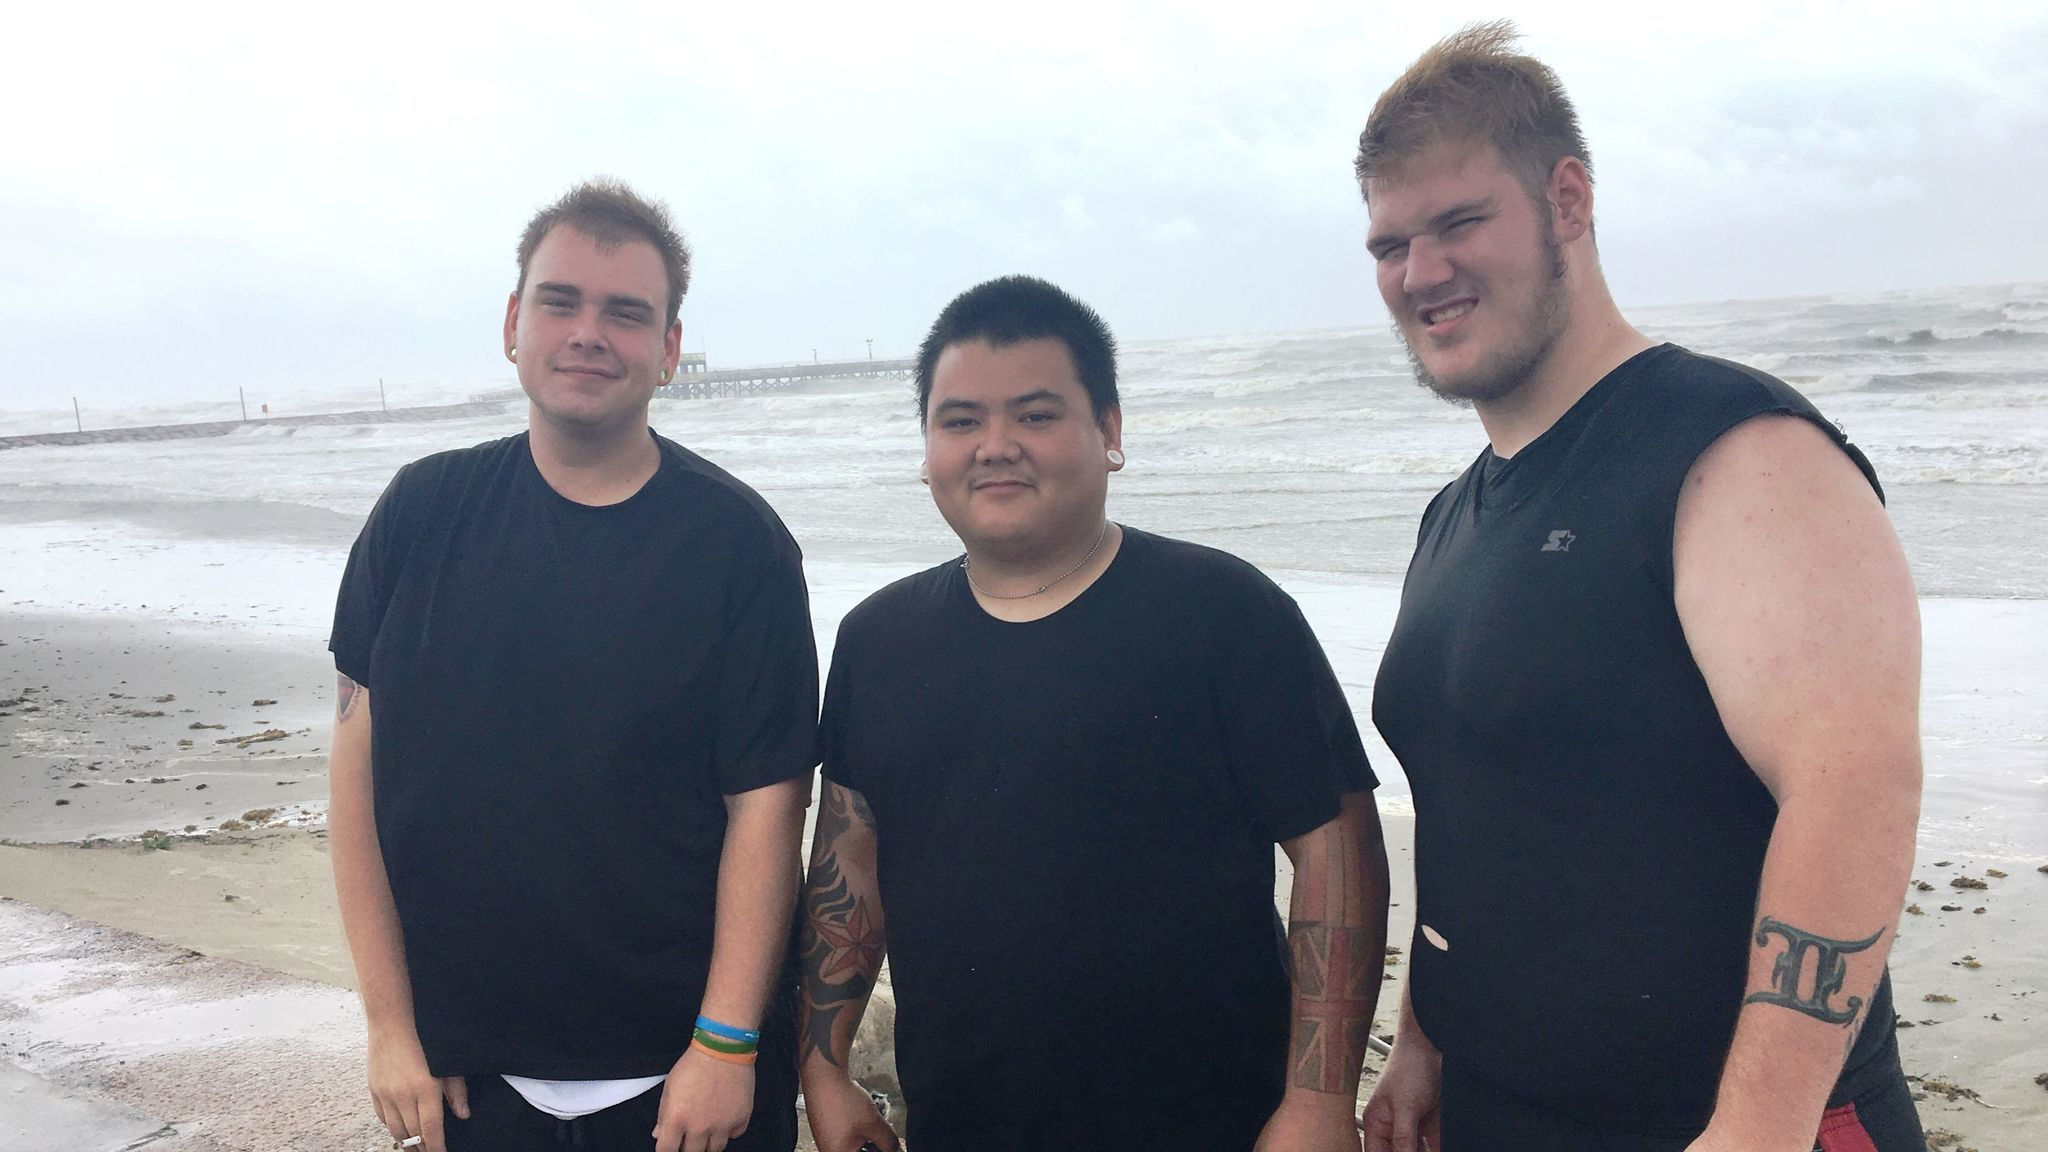 William Mead, Branden Castillo and James Hibberts contemplate skimboarding in Galveston.